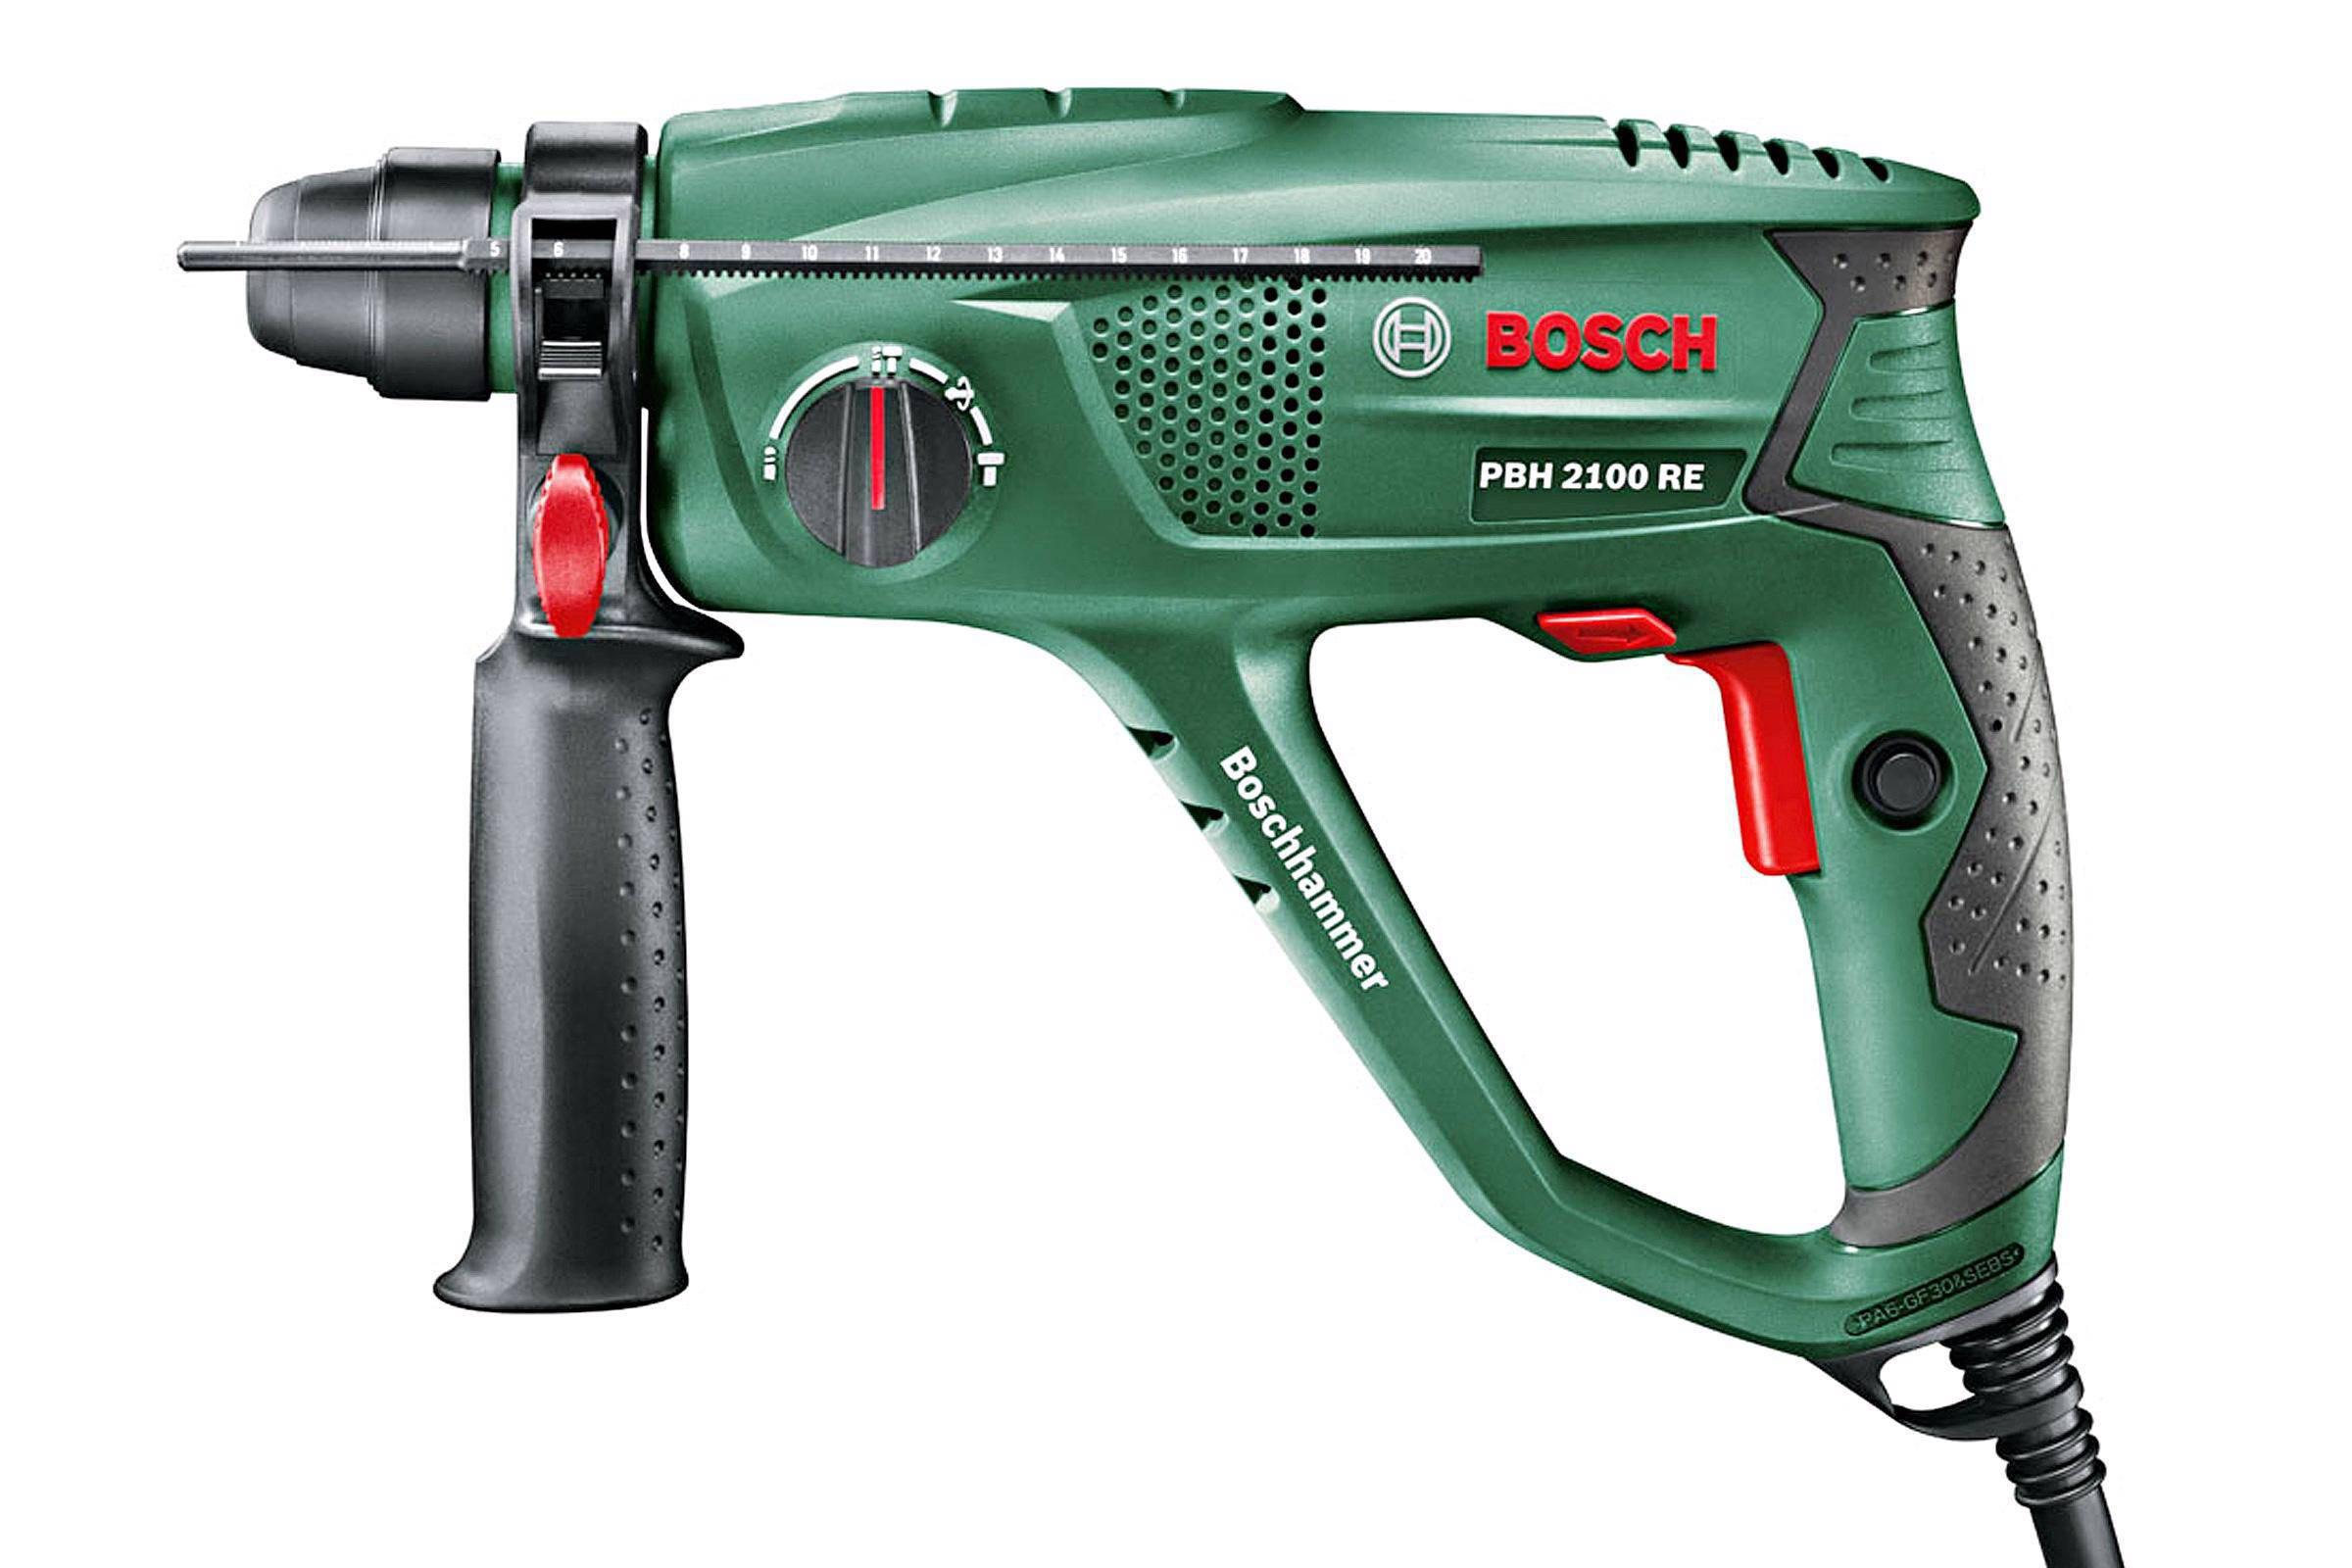 Bekend Bosch PBH 2100 RE boorhamer   wehkamp MG34